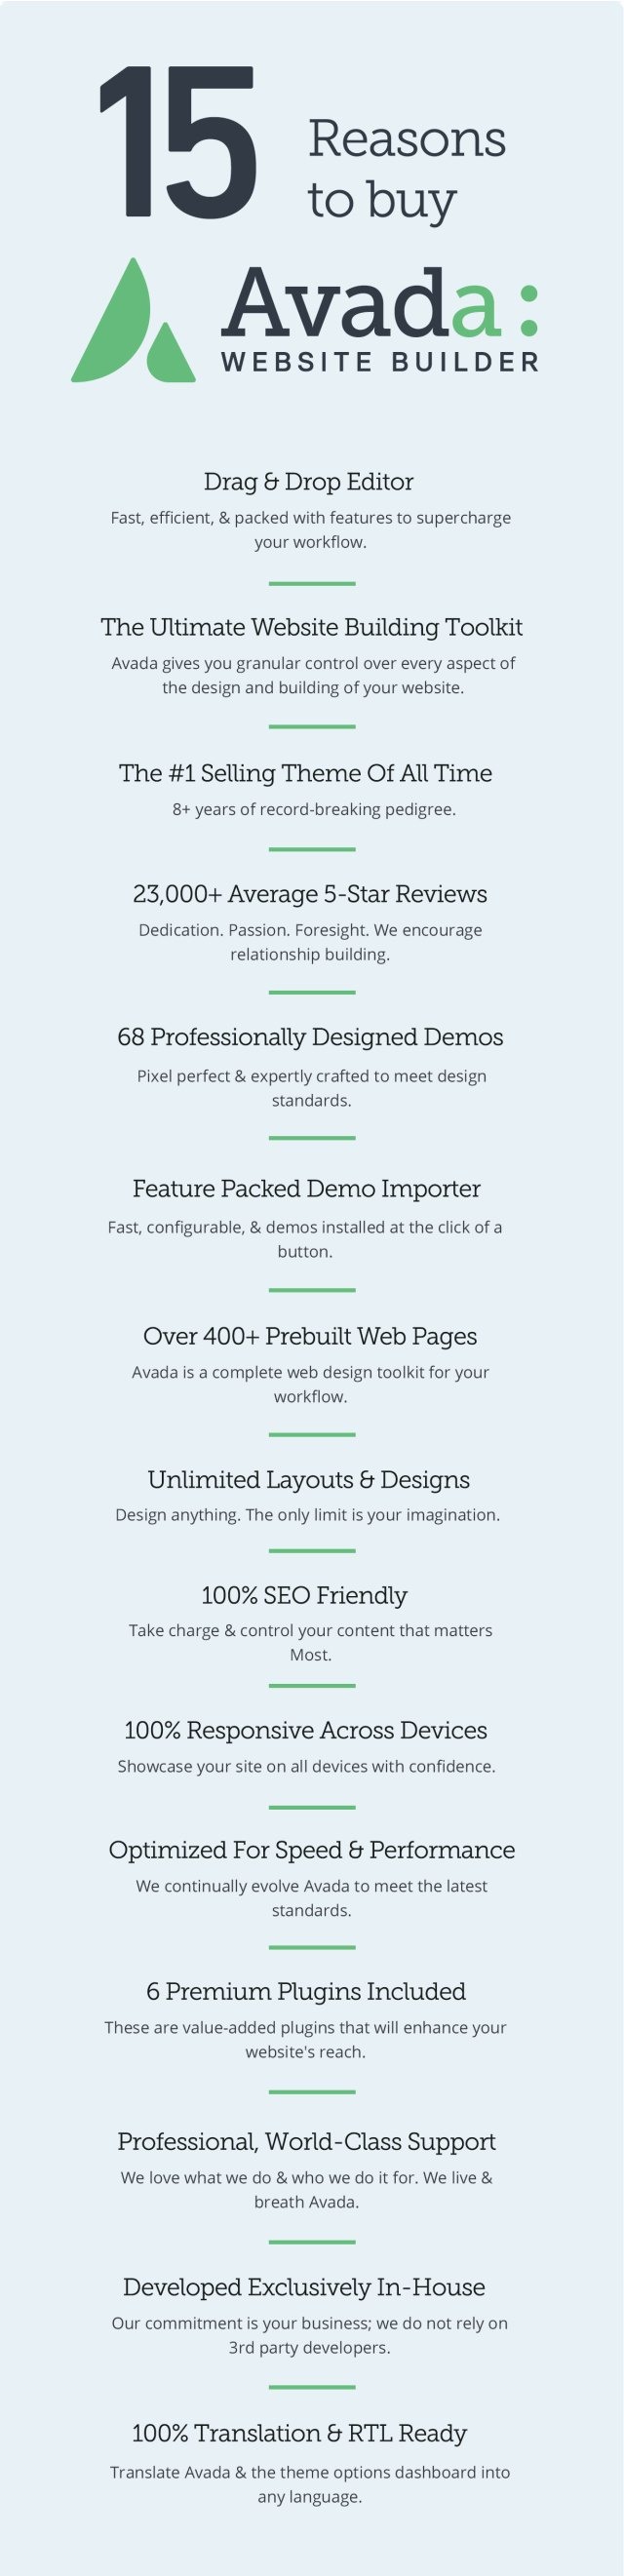 Avada   Website Builder For WordPress & WooCommerce - 27